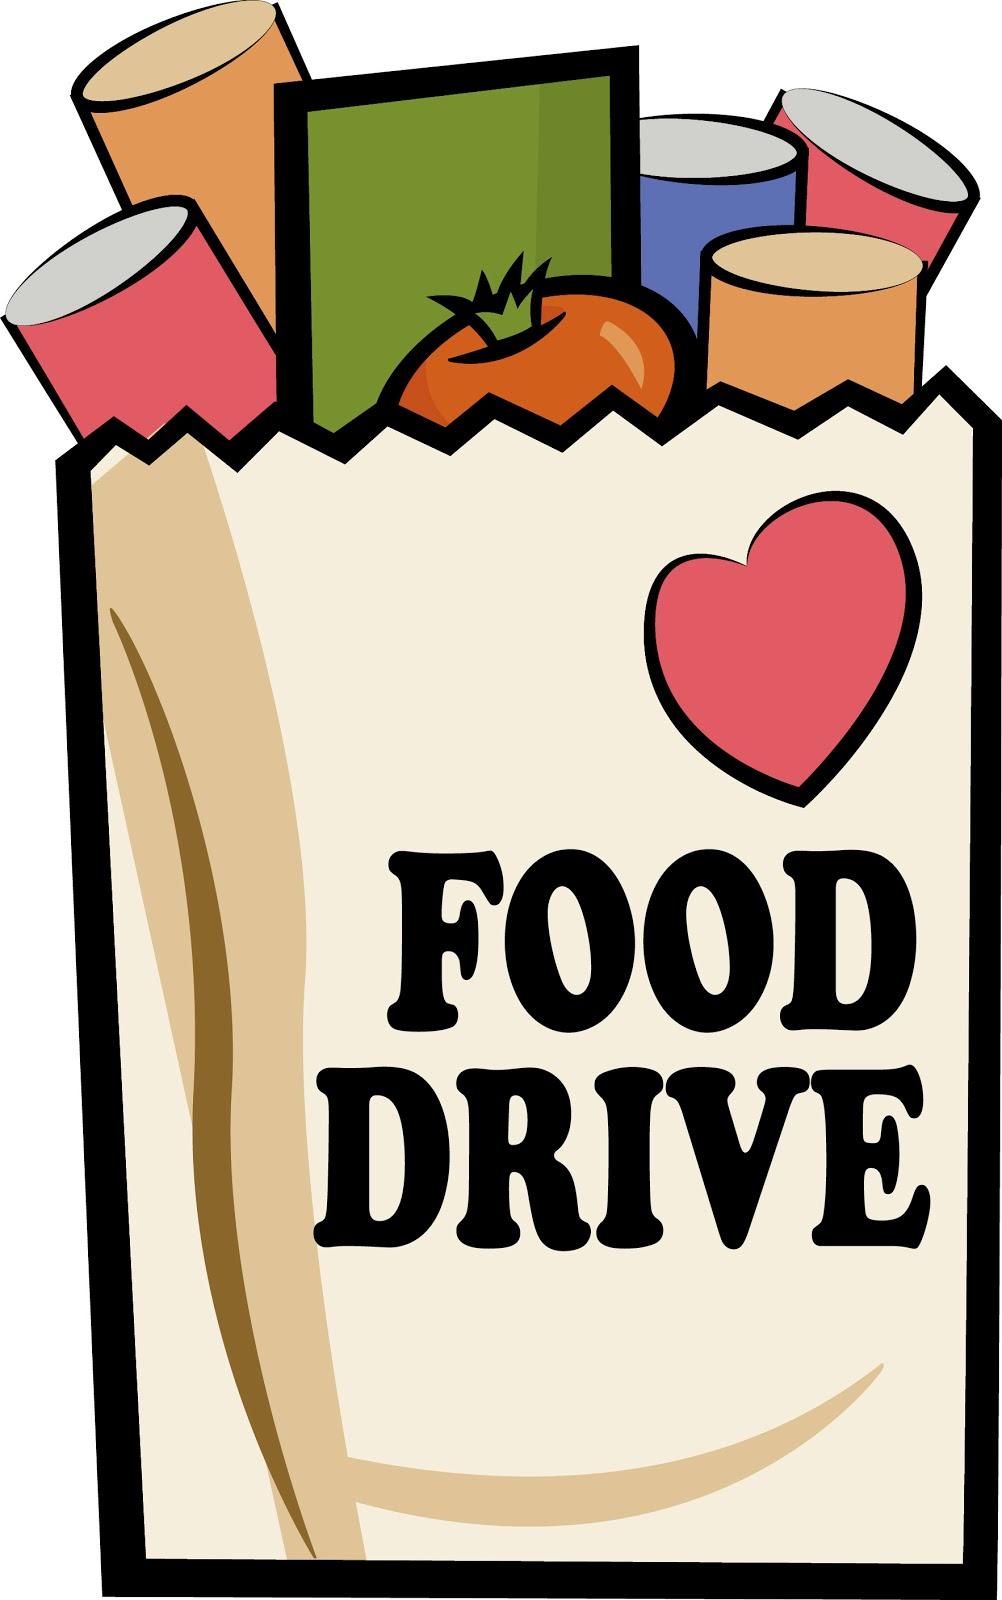 canned food drive posters-canned food drive posters-15